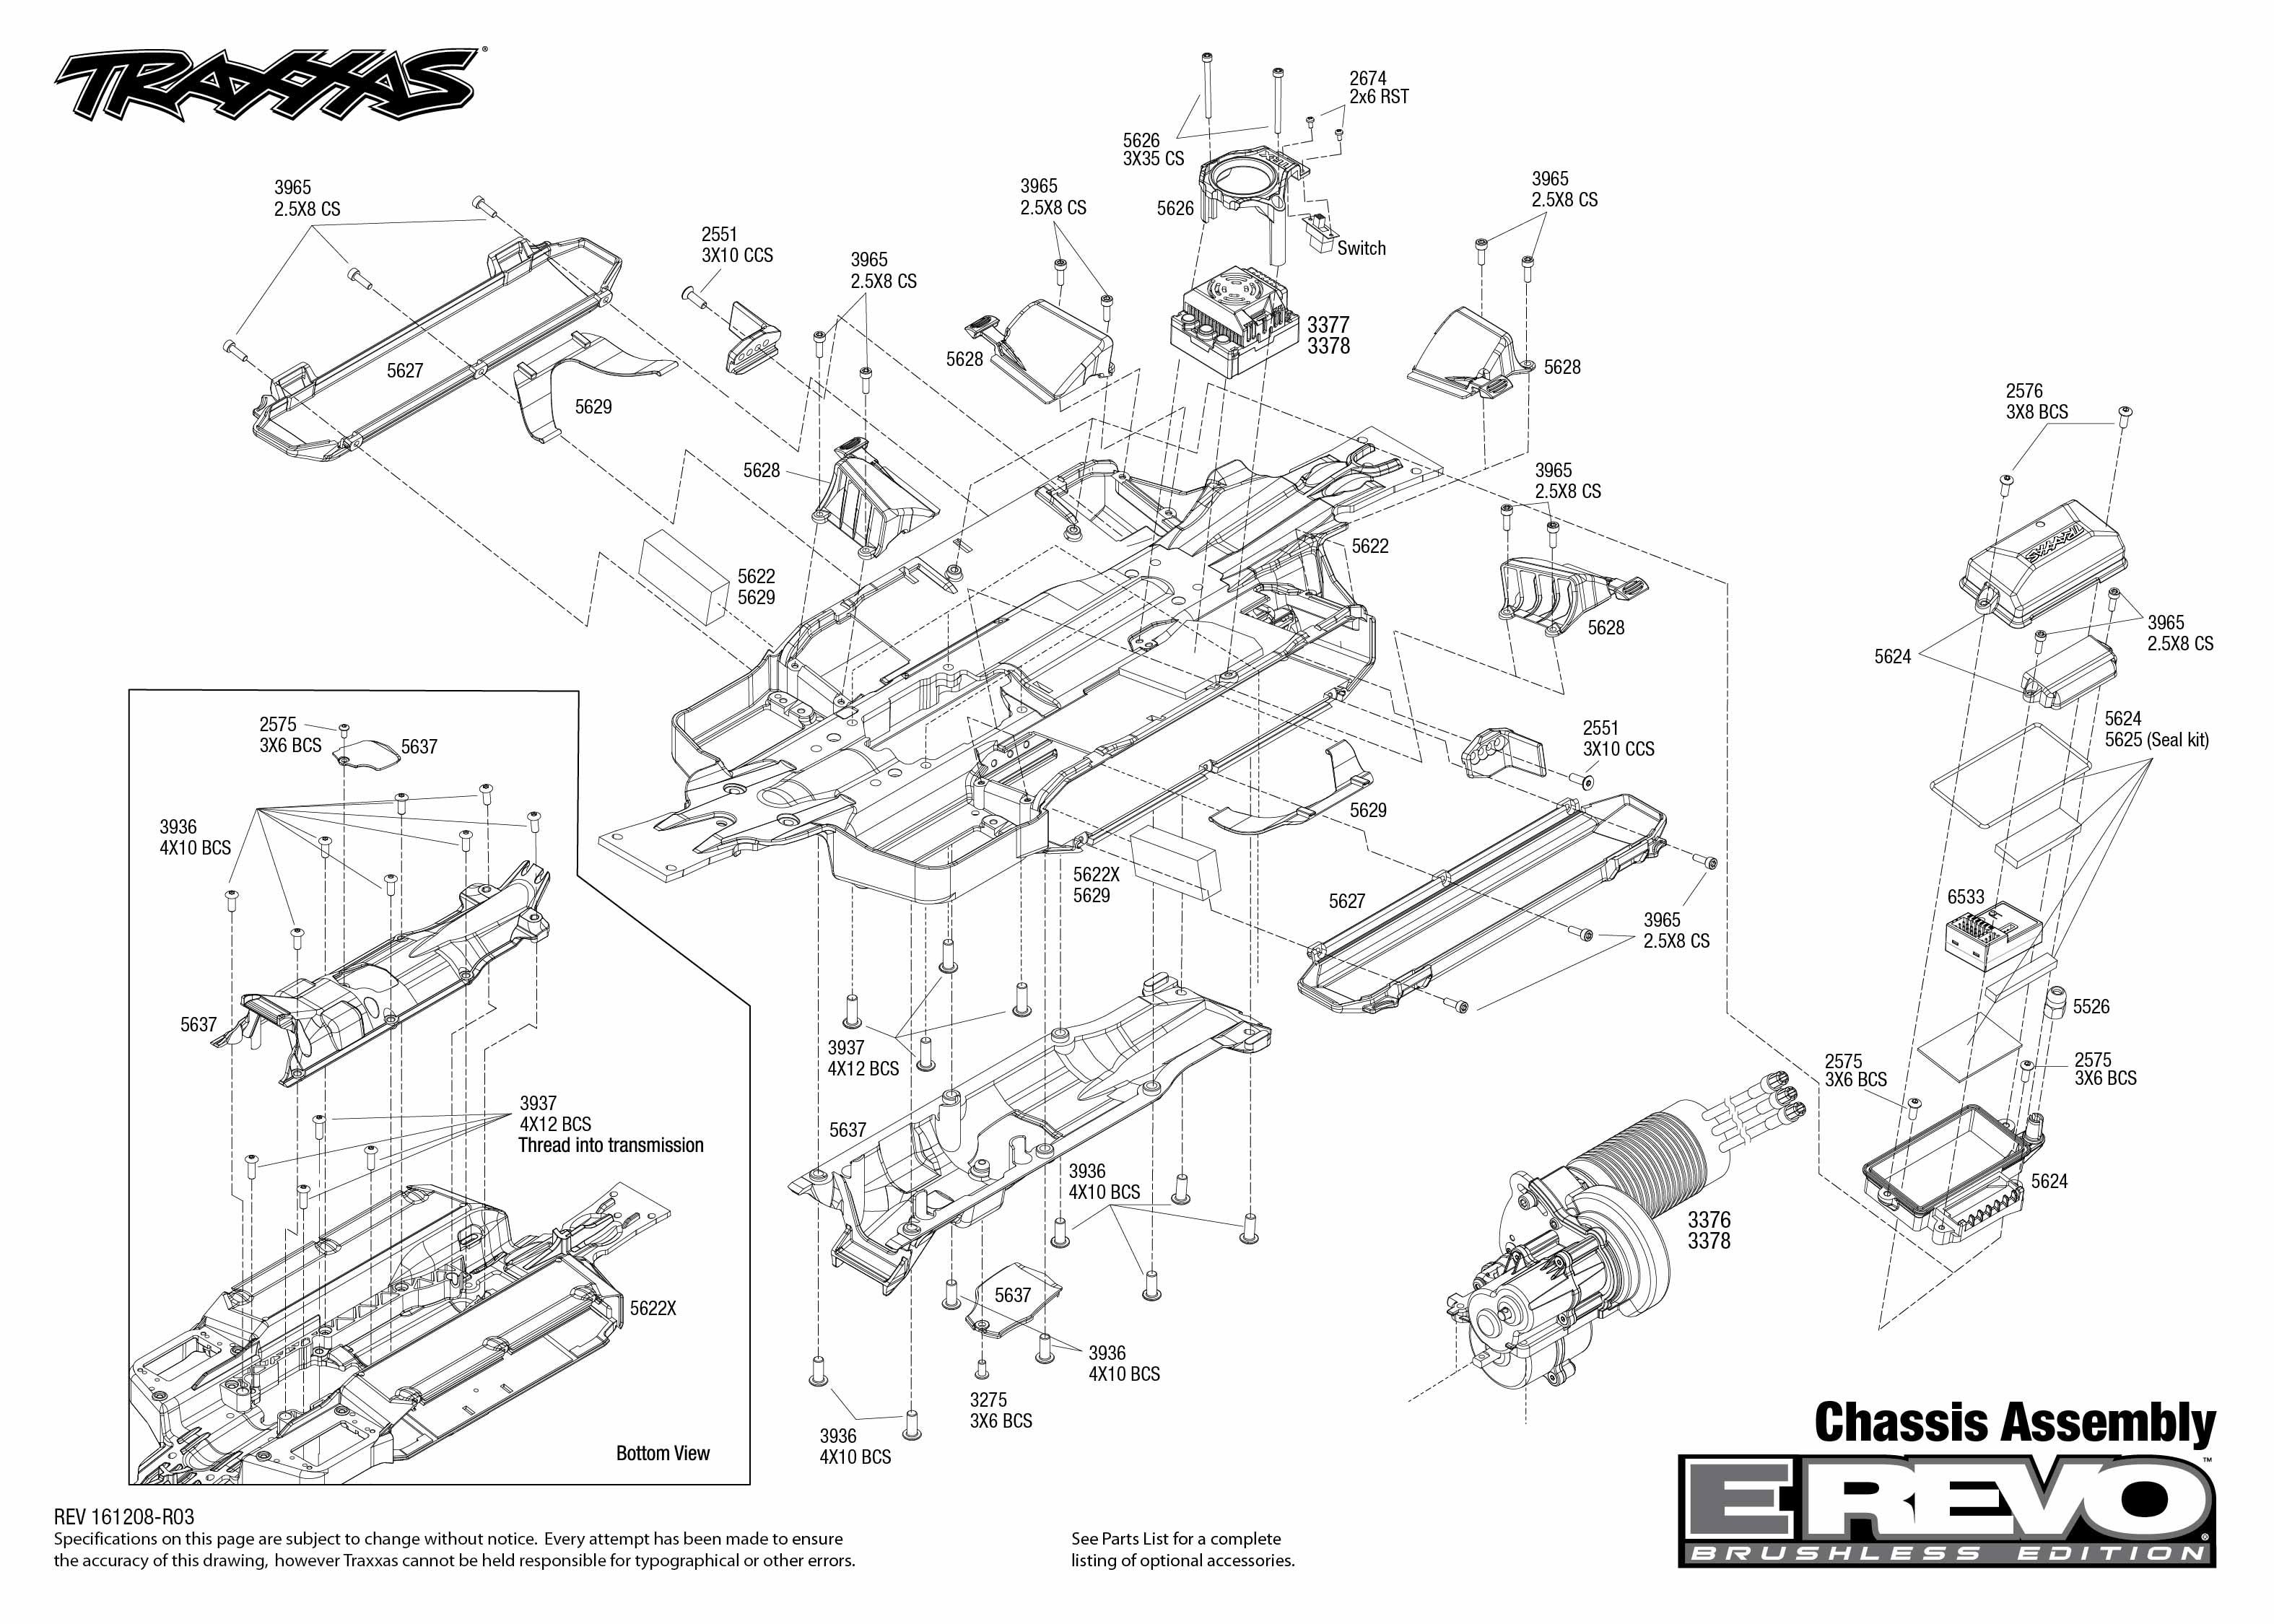 Revo 3 Wiring Diagram Trusted Diagrams Car Gas Engine Traxxas Application U2022 Rh Cleanairclub Co Model T Club